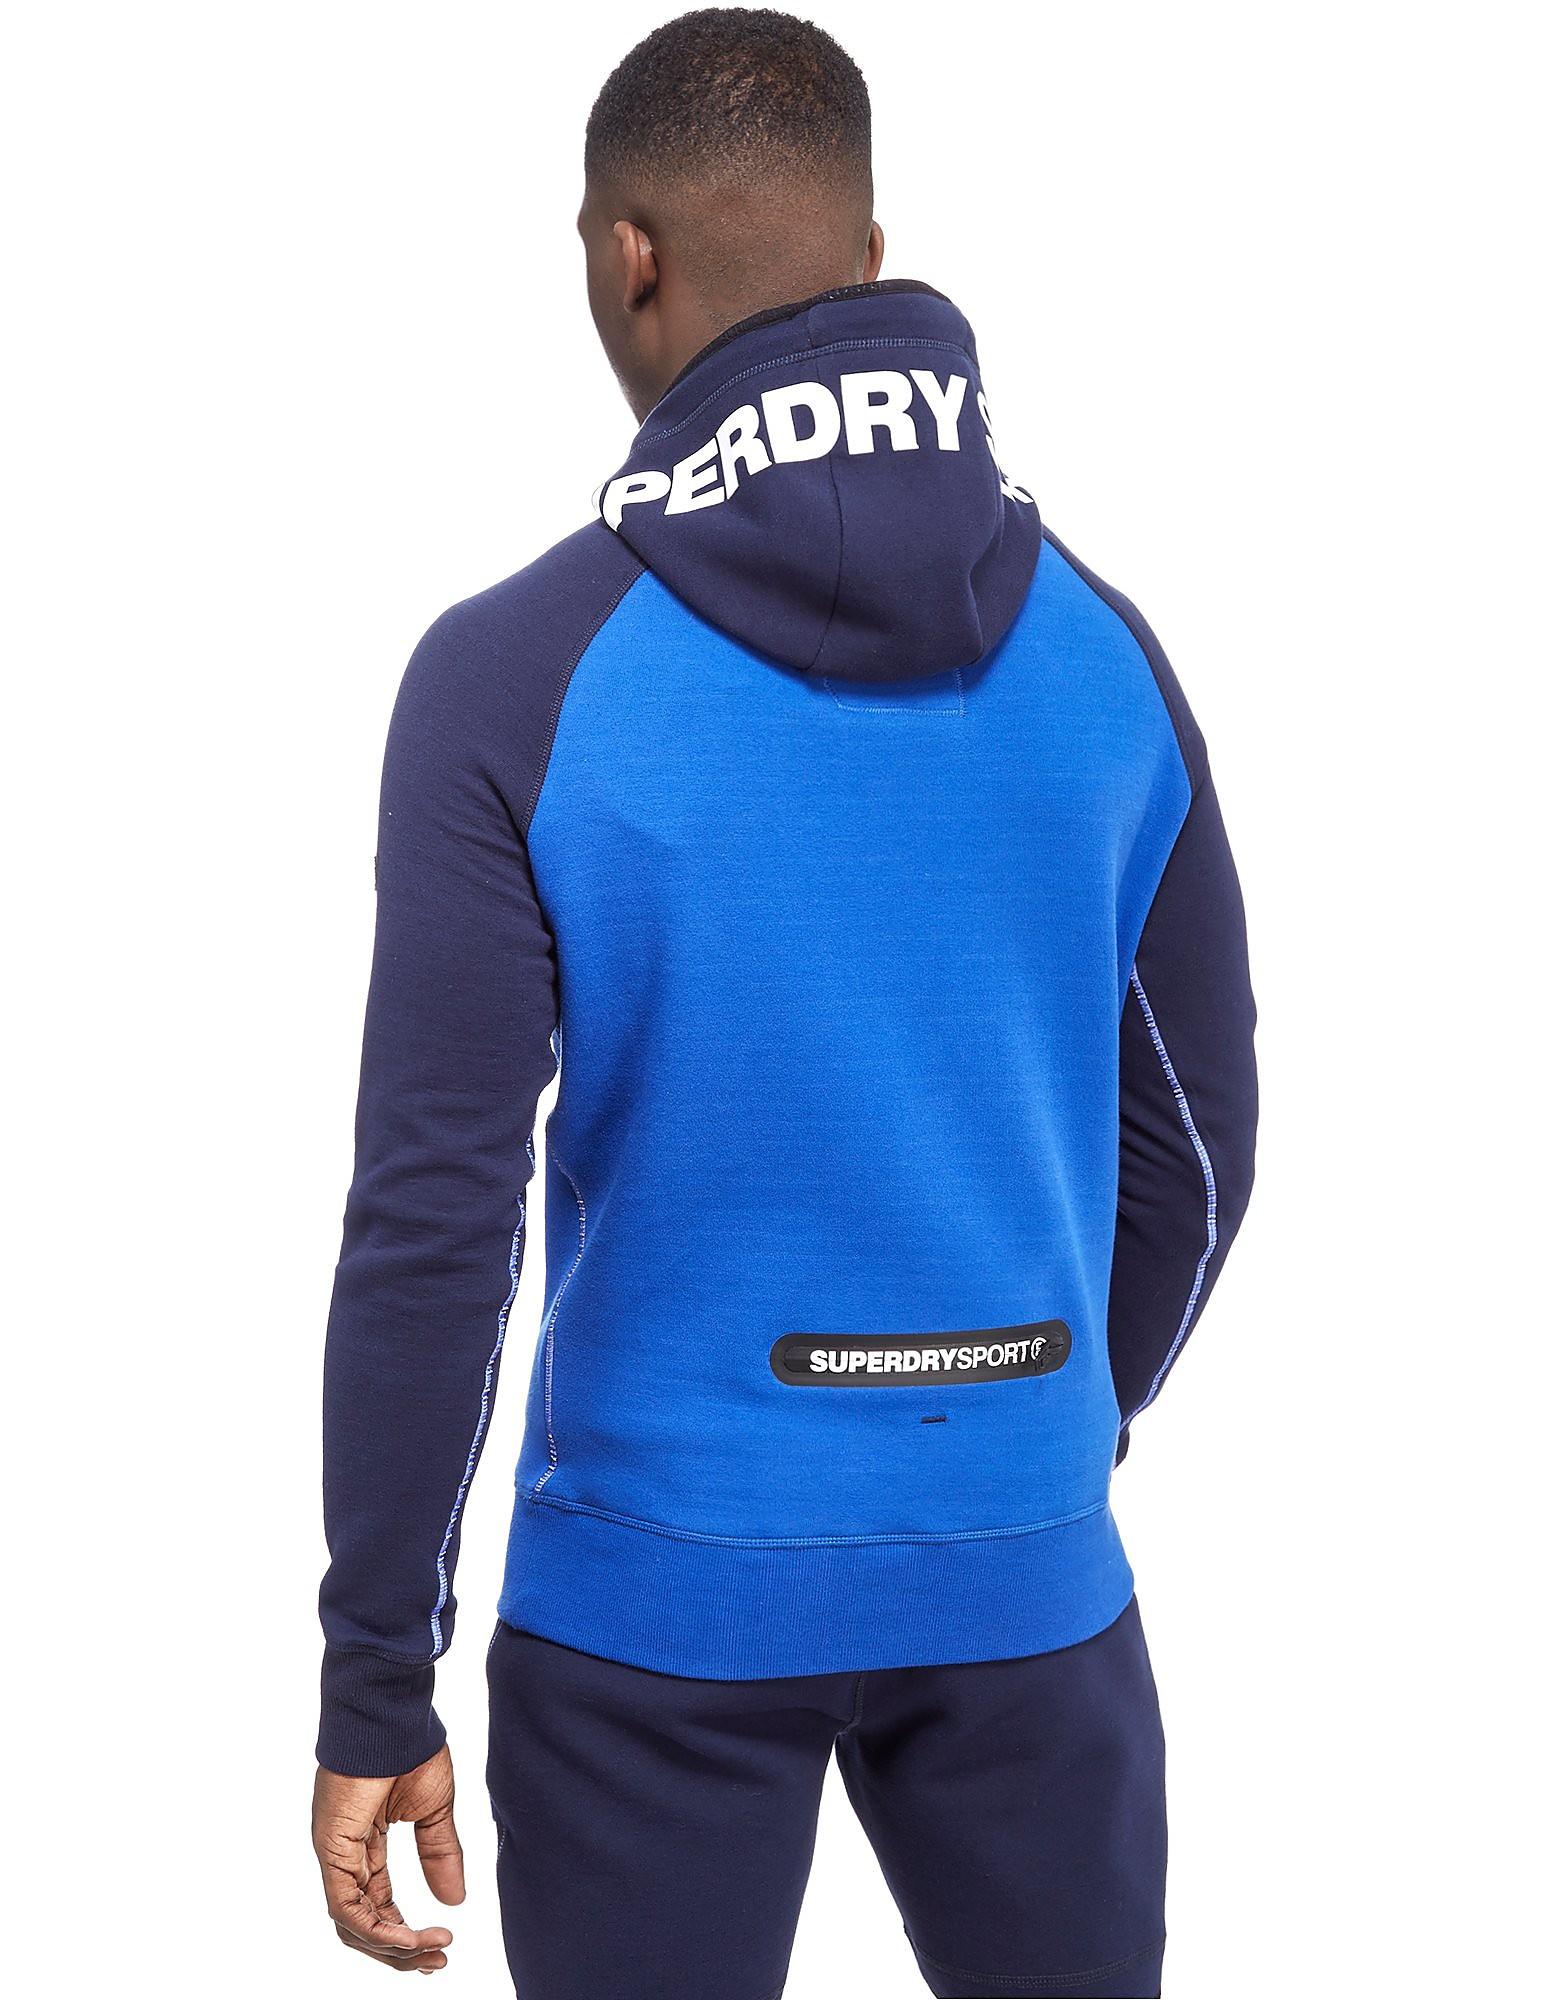 Superdry Gym Tech Raglan Hoody